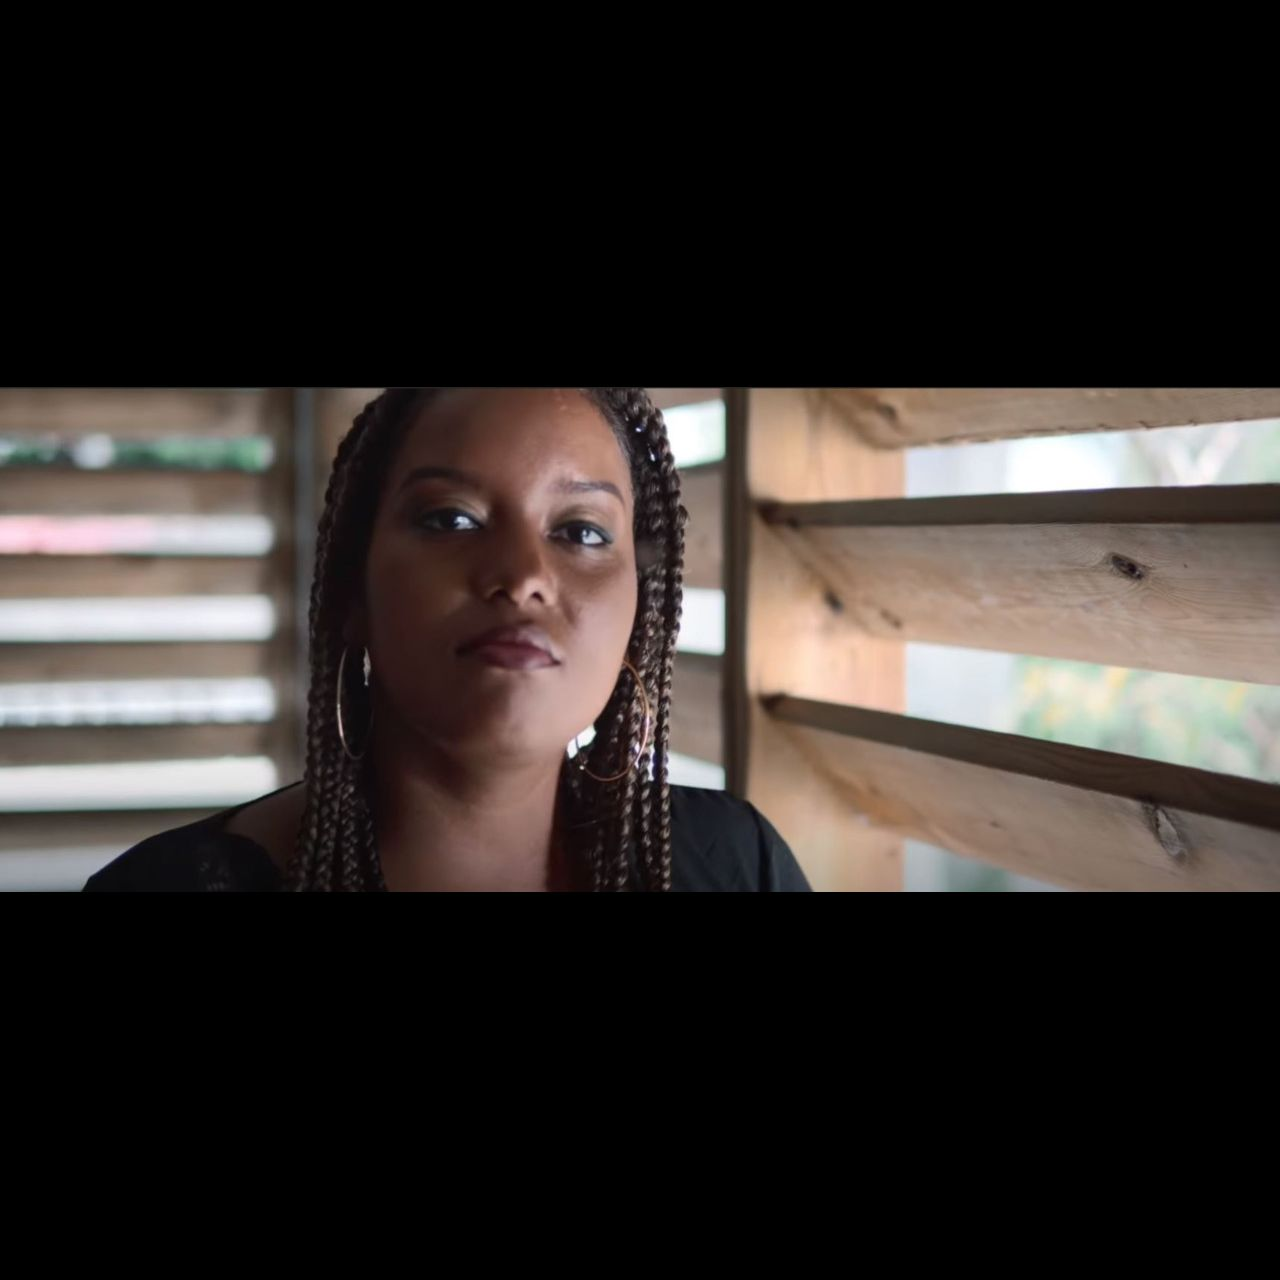 Maurane Voyer - Tayé (Thumbnail)